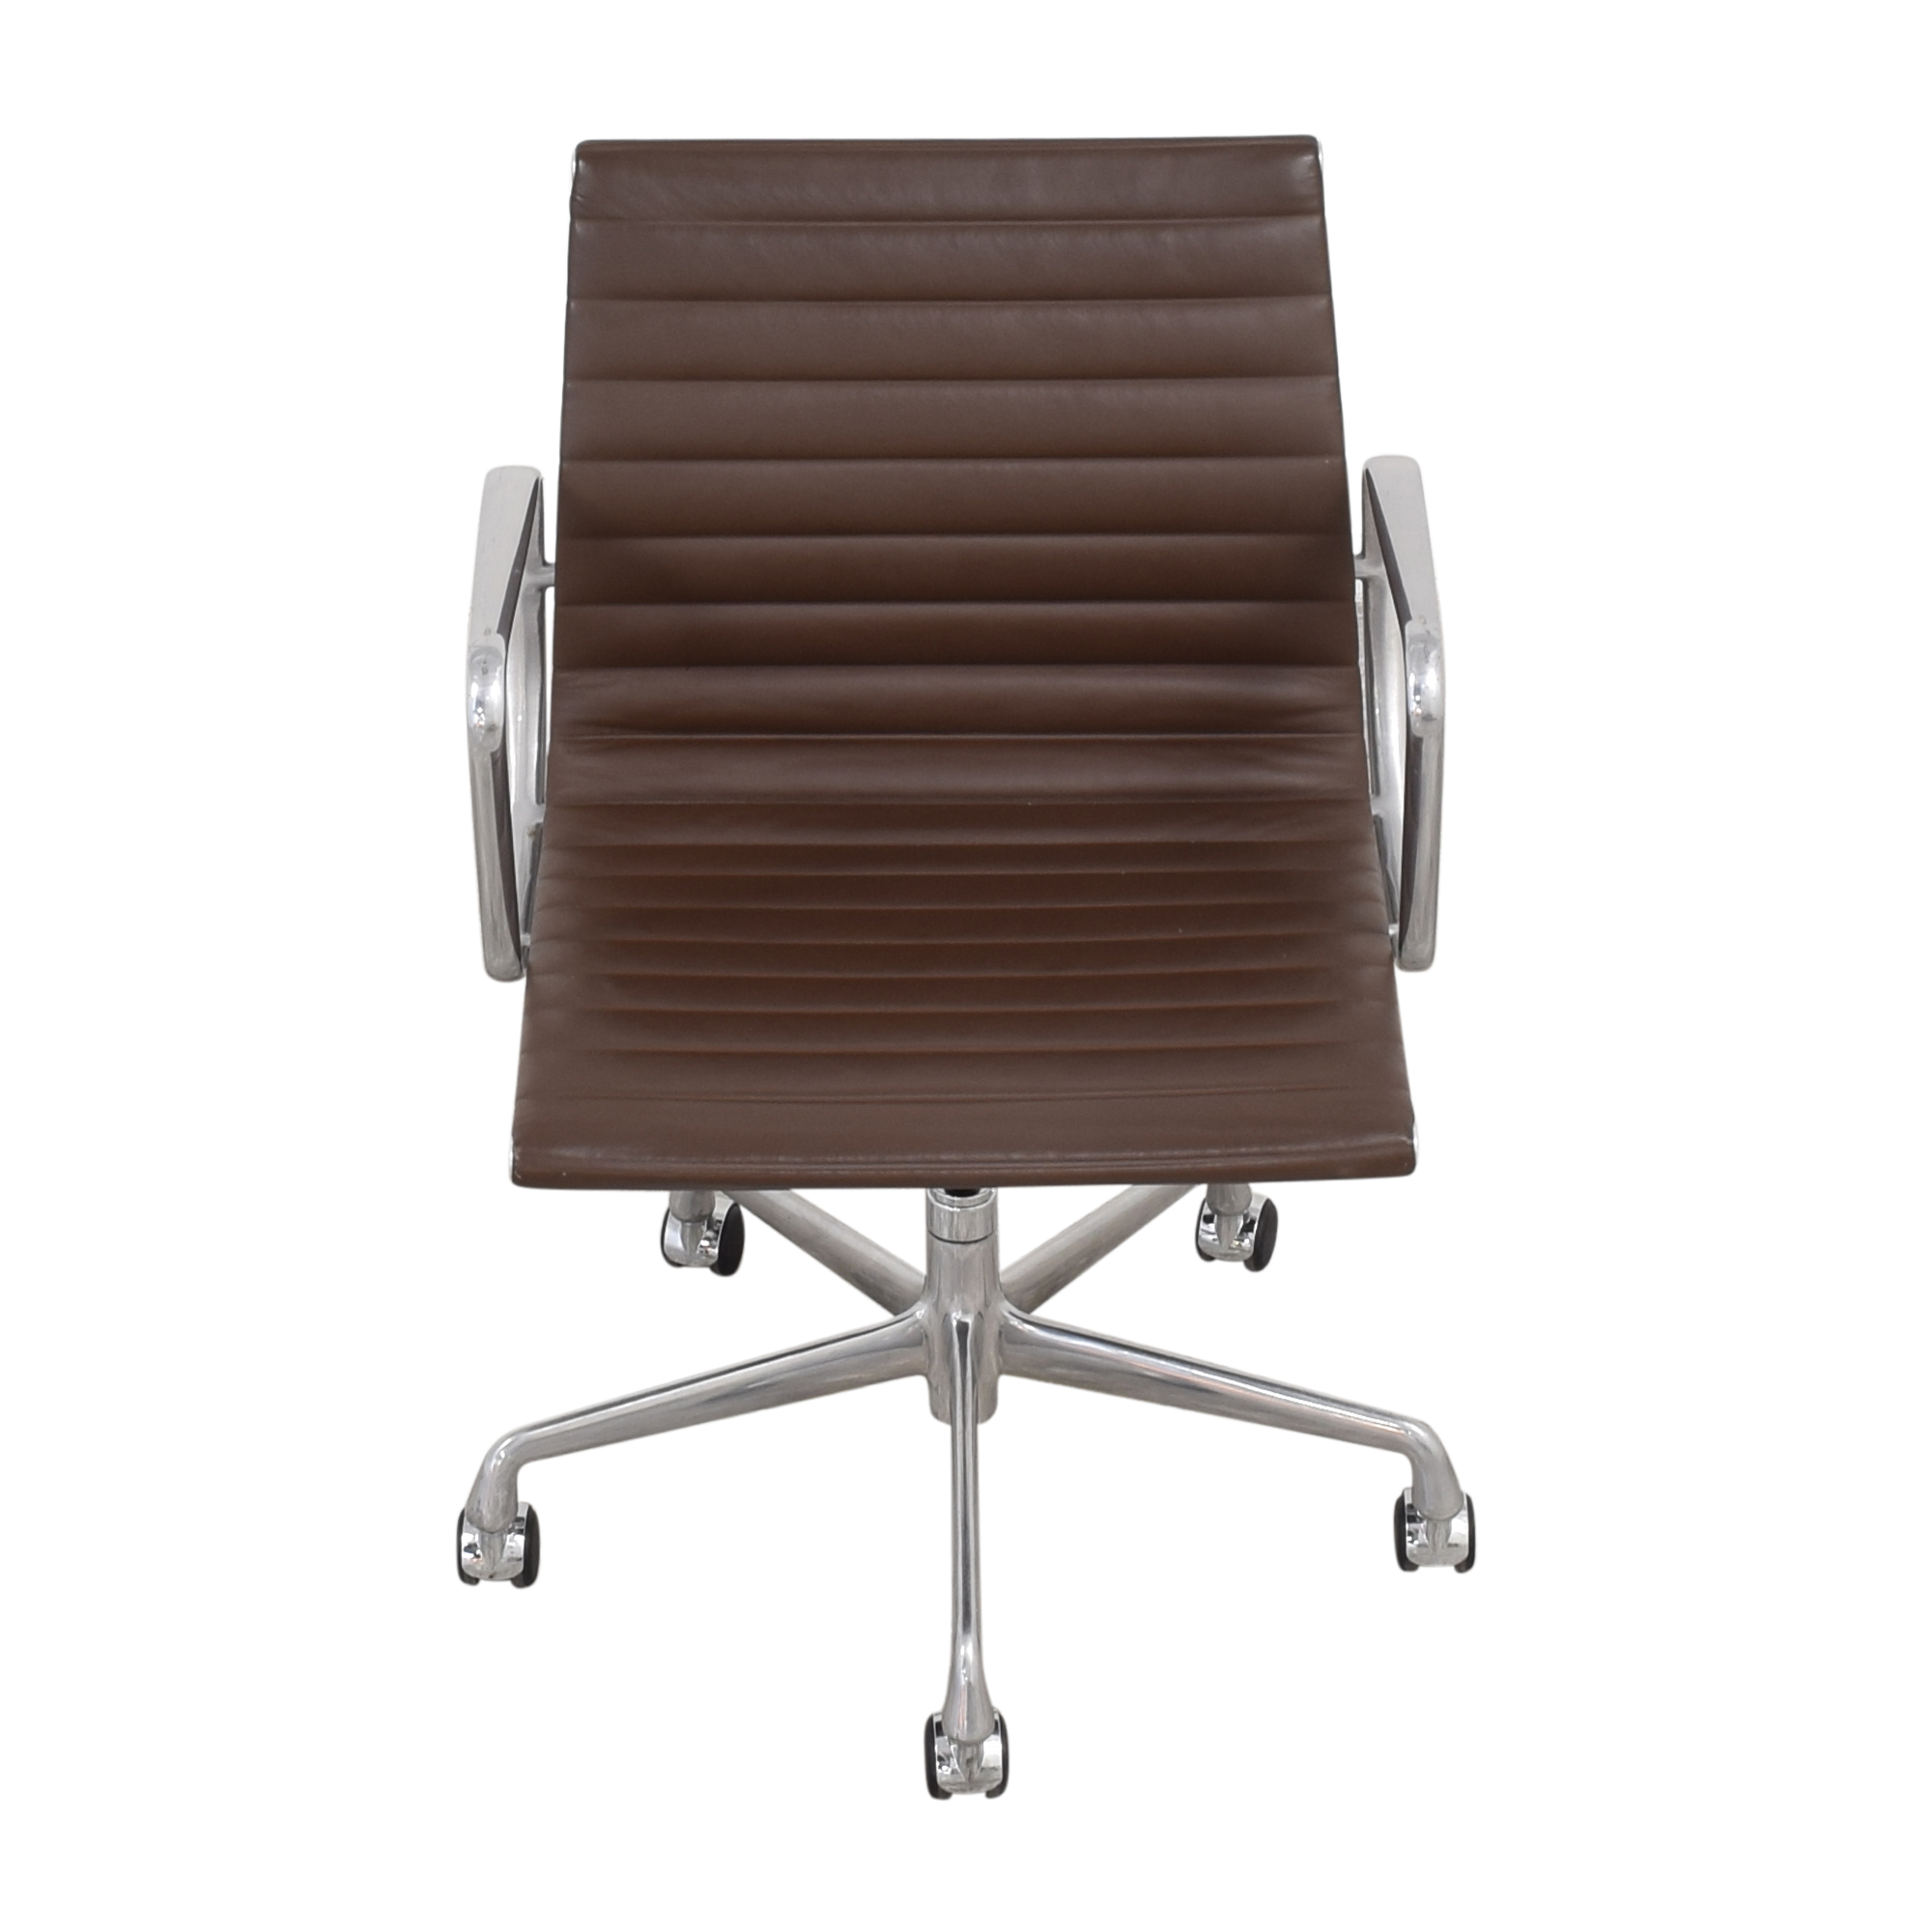 Herman Miller Herman Miller Eames Aluminum Group Management Chair nyc